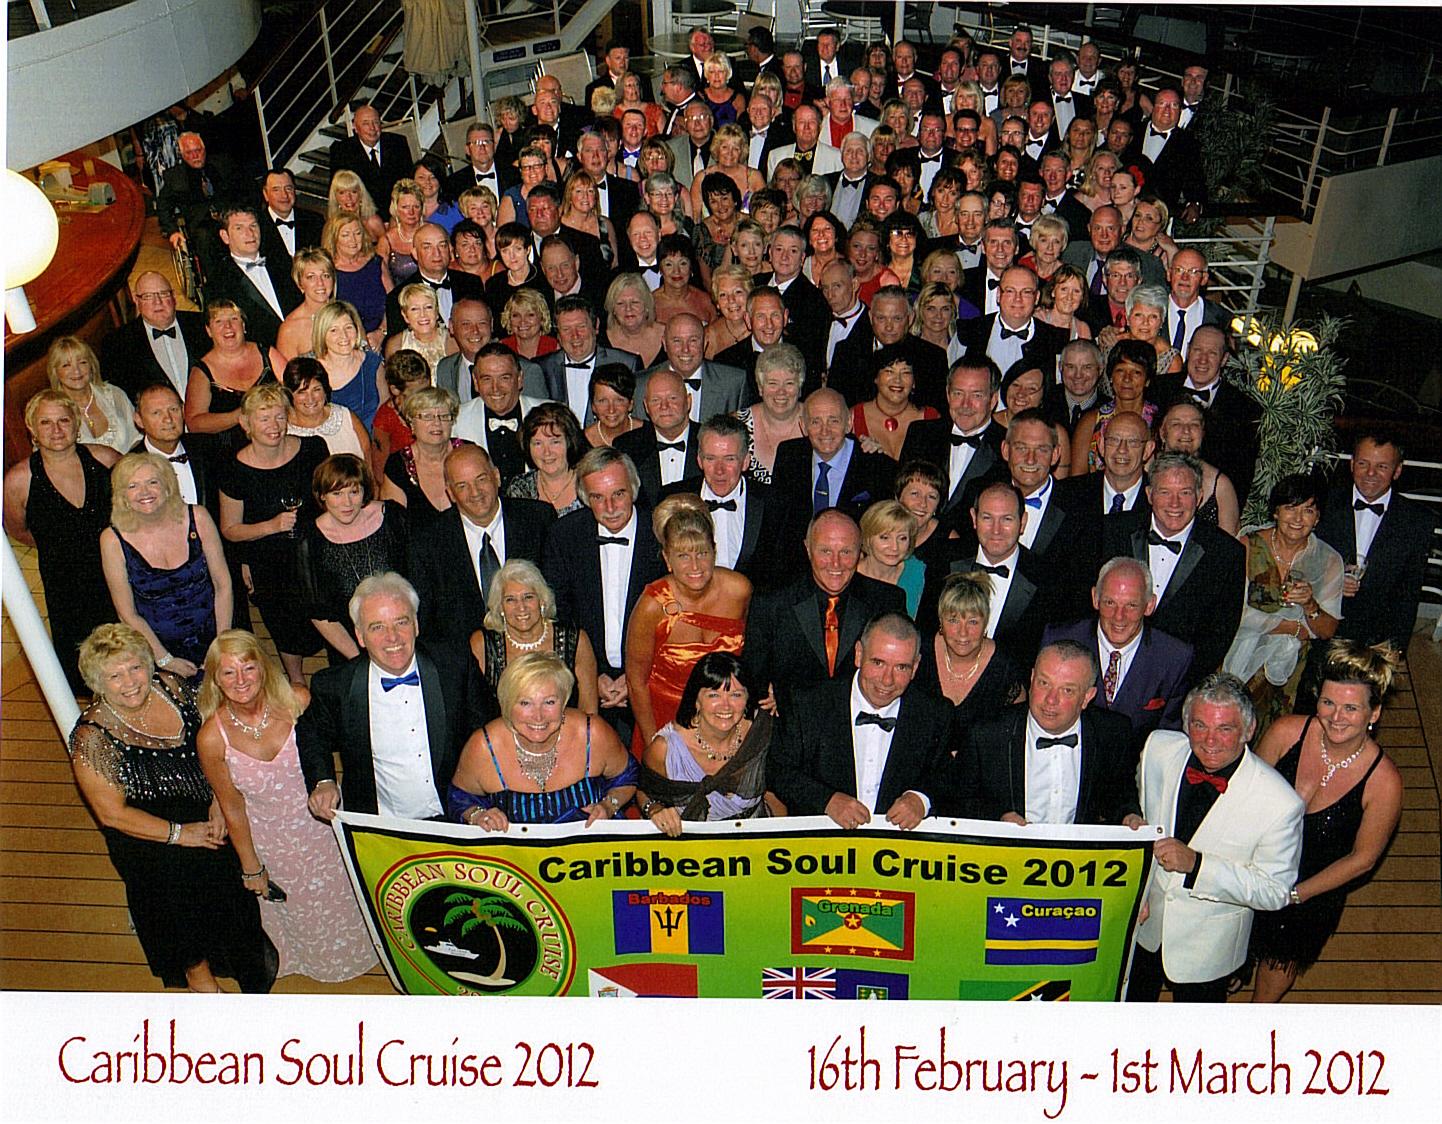 Caribbean Soul: Caribbean Soul Cruise 2012 Group Photo